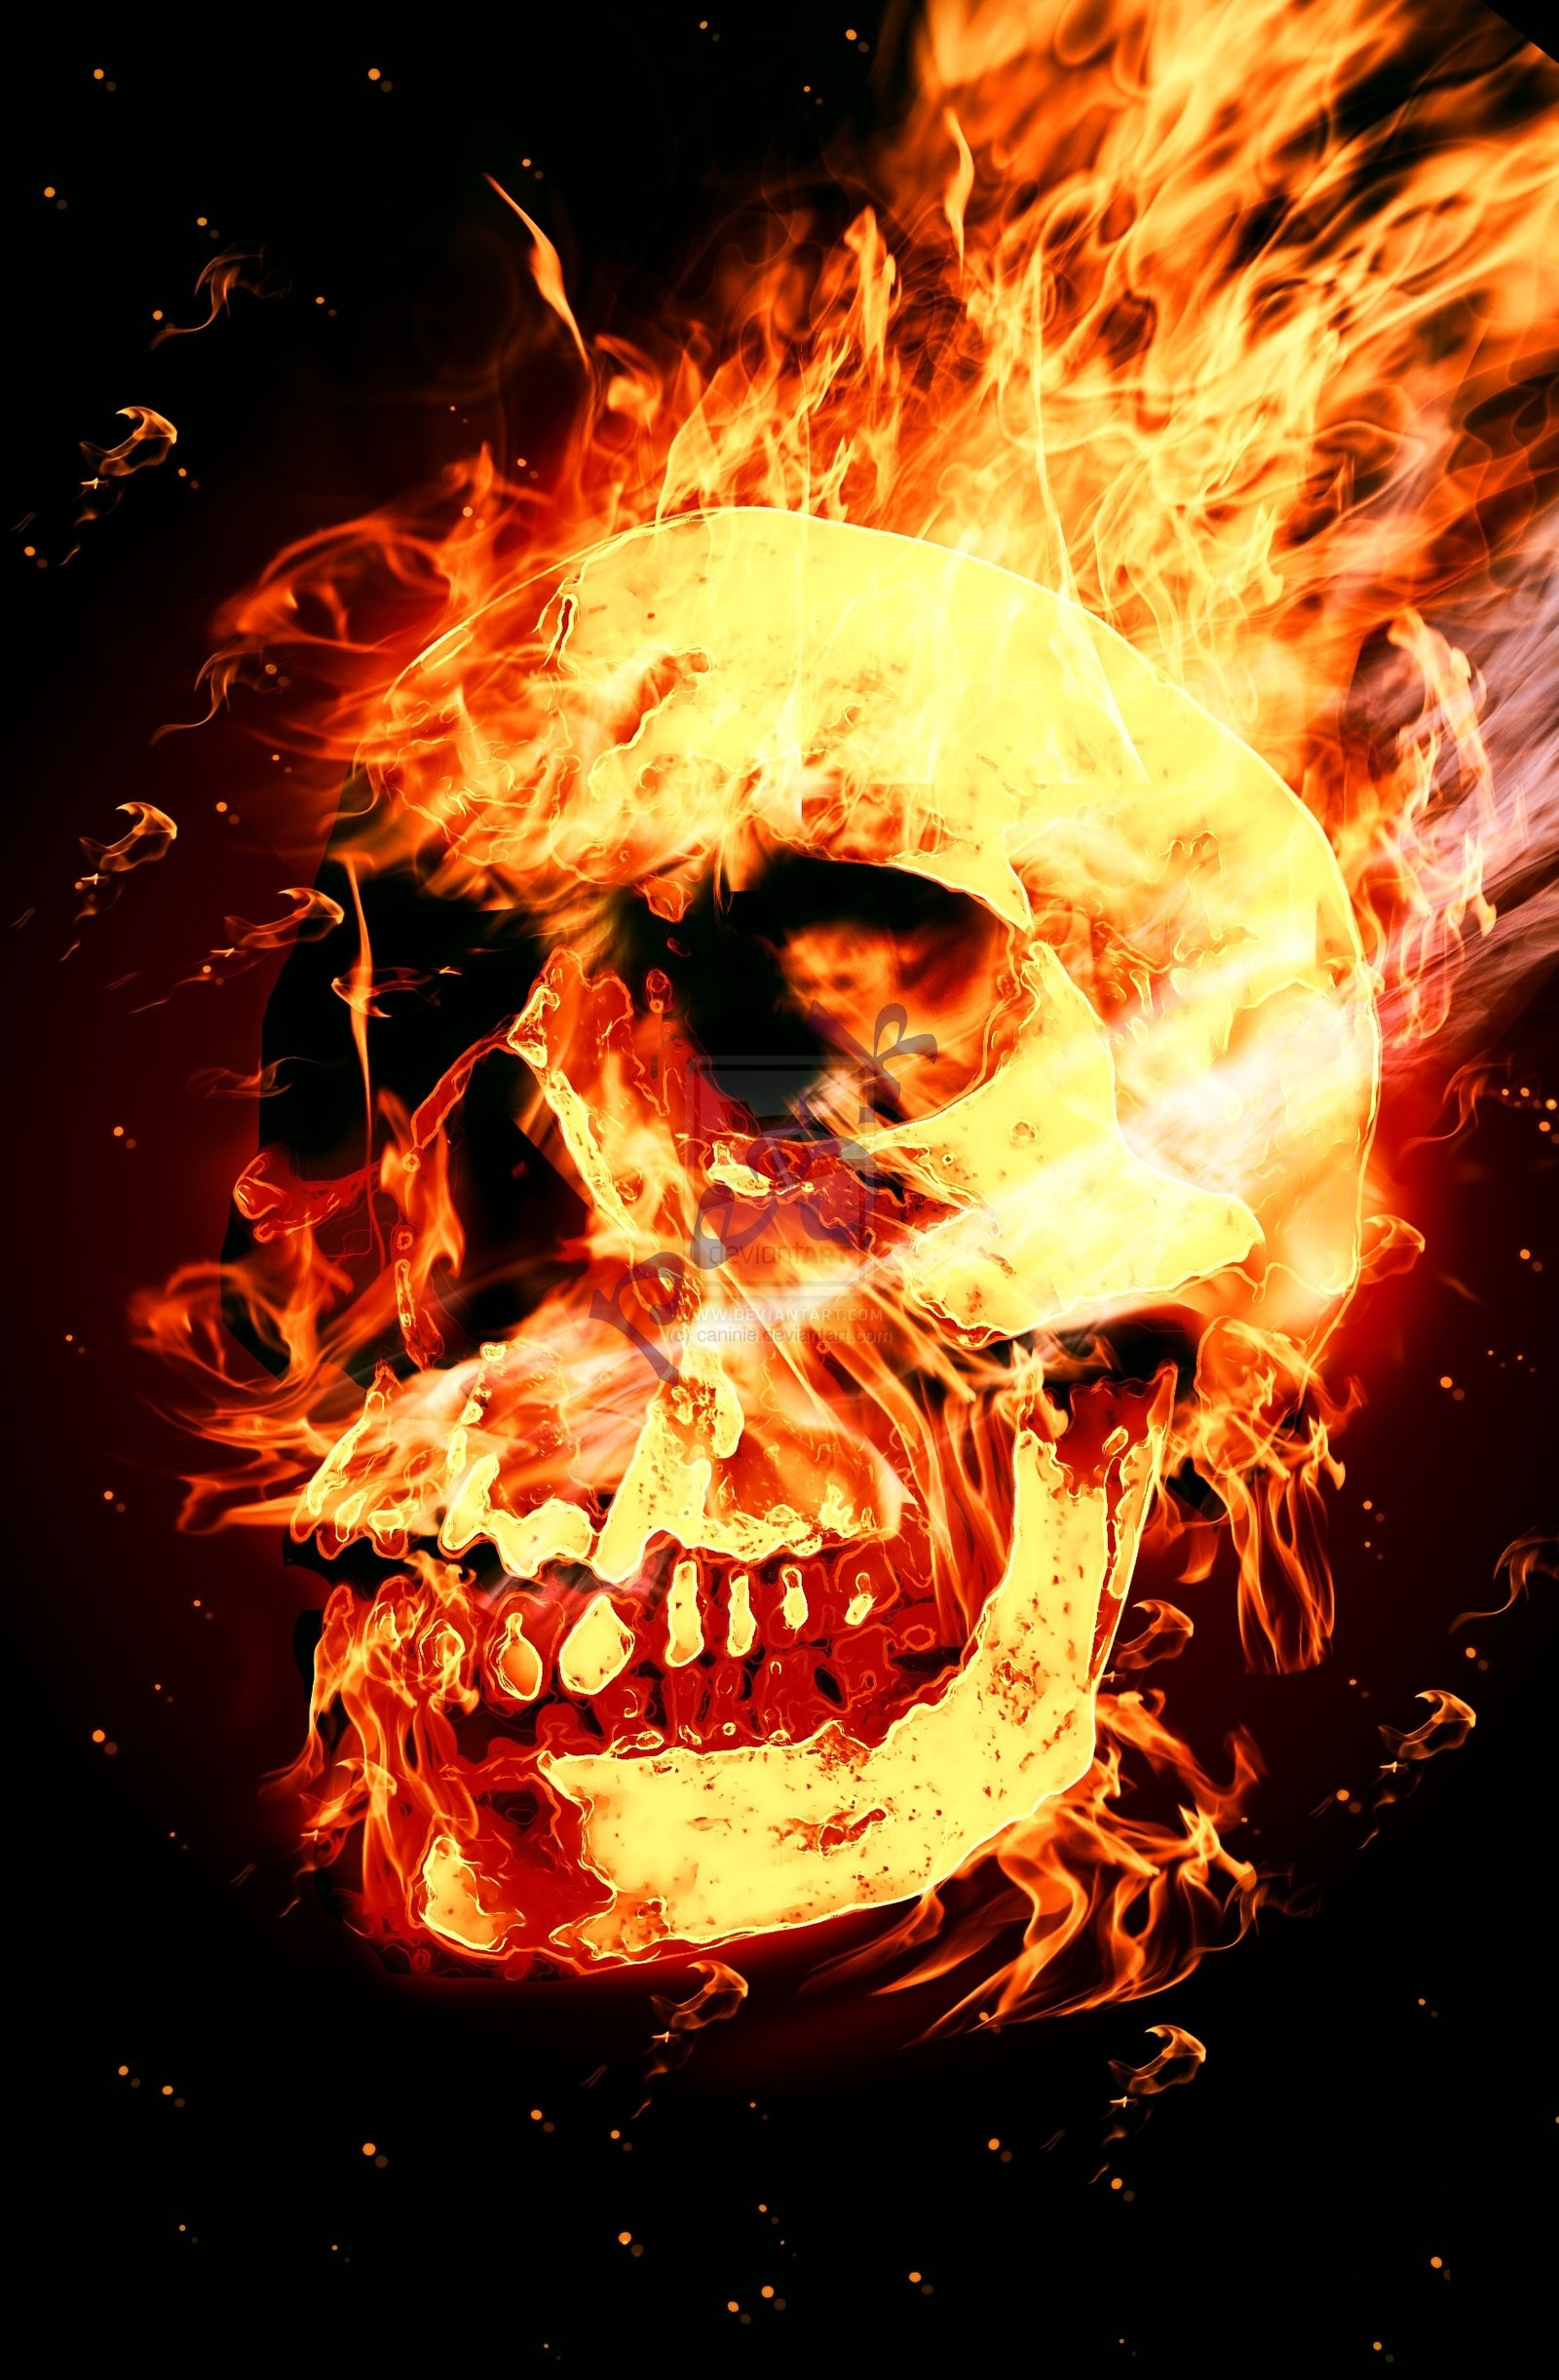 Fire Skull Pics, wallpaper, Fire Skull Pics hd wallpaper, background .